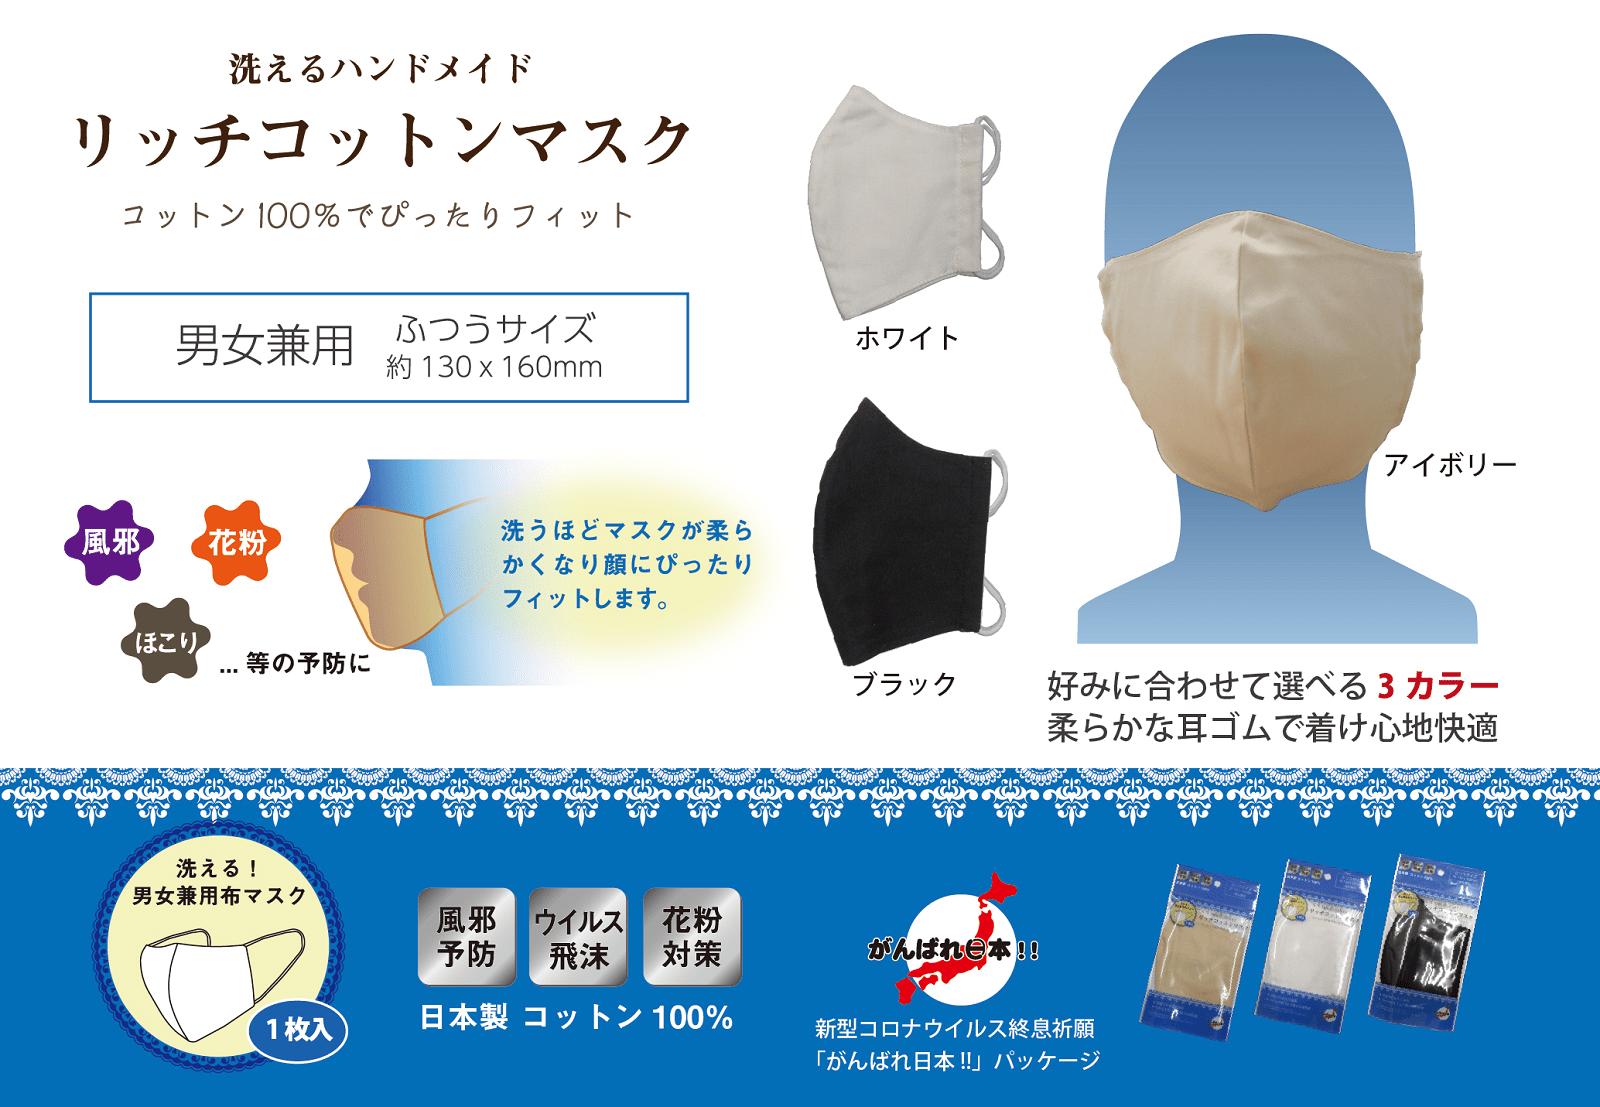 BR-958 洗えるハンドメイド リッチコットンマスク1枚入り 日本製